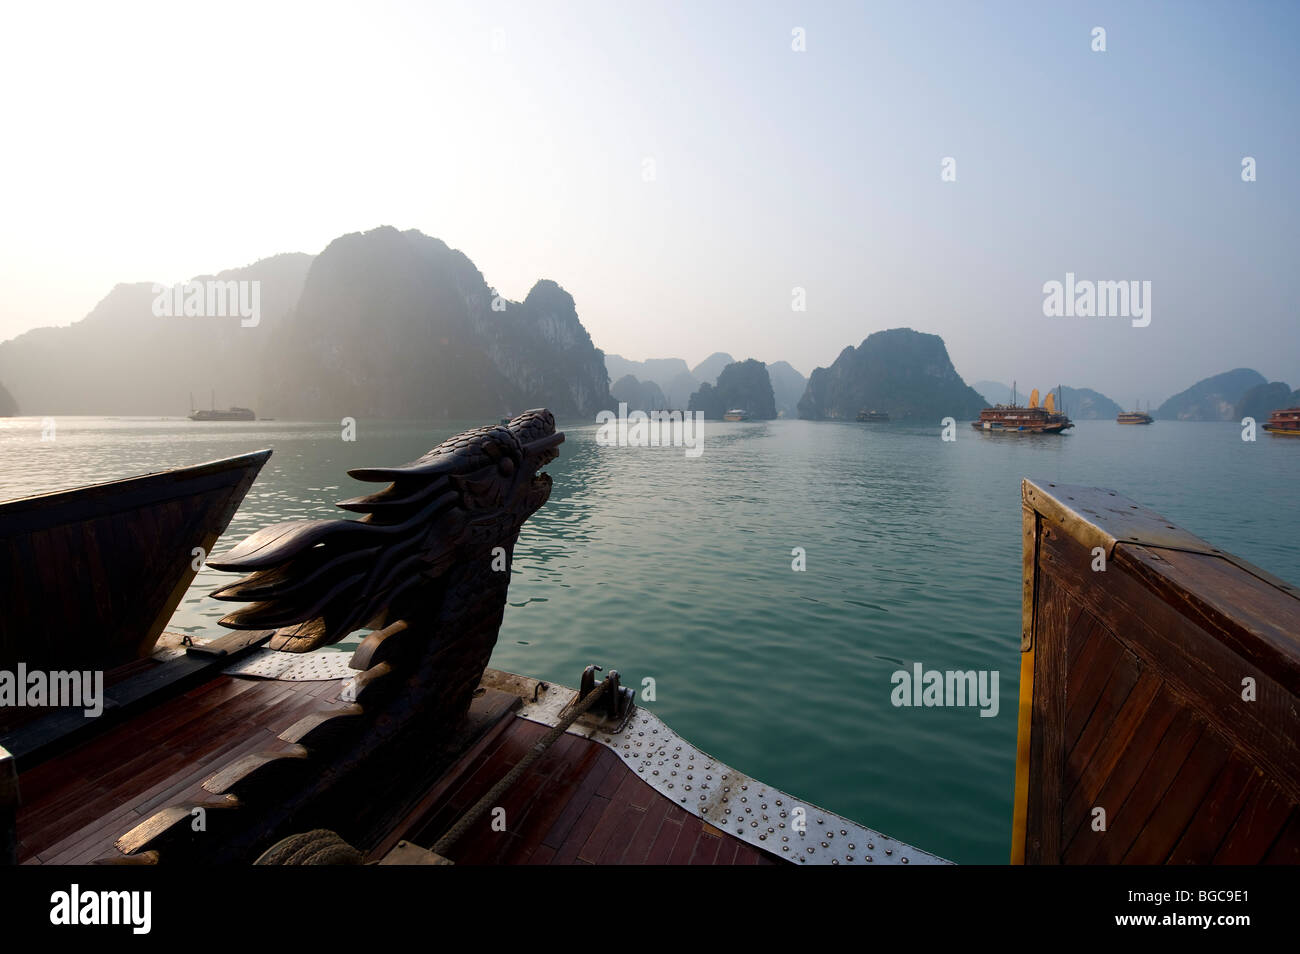 Cruising on a wooden Junk boat, Halong Bay Vietnam - Stock Image